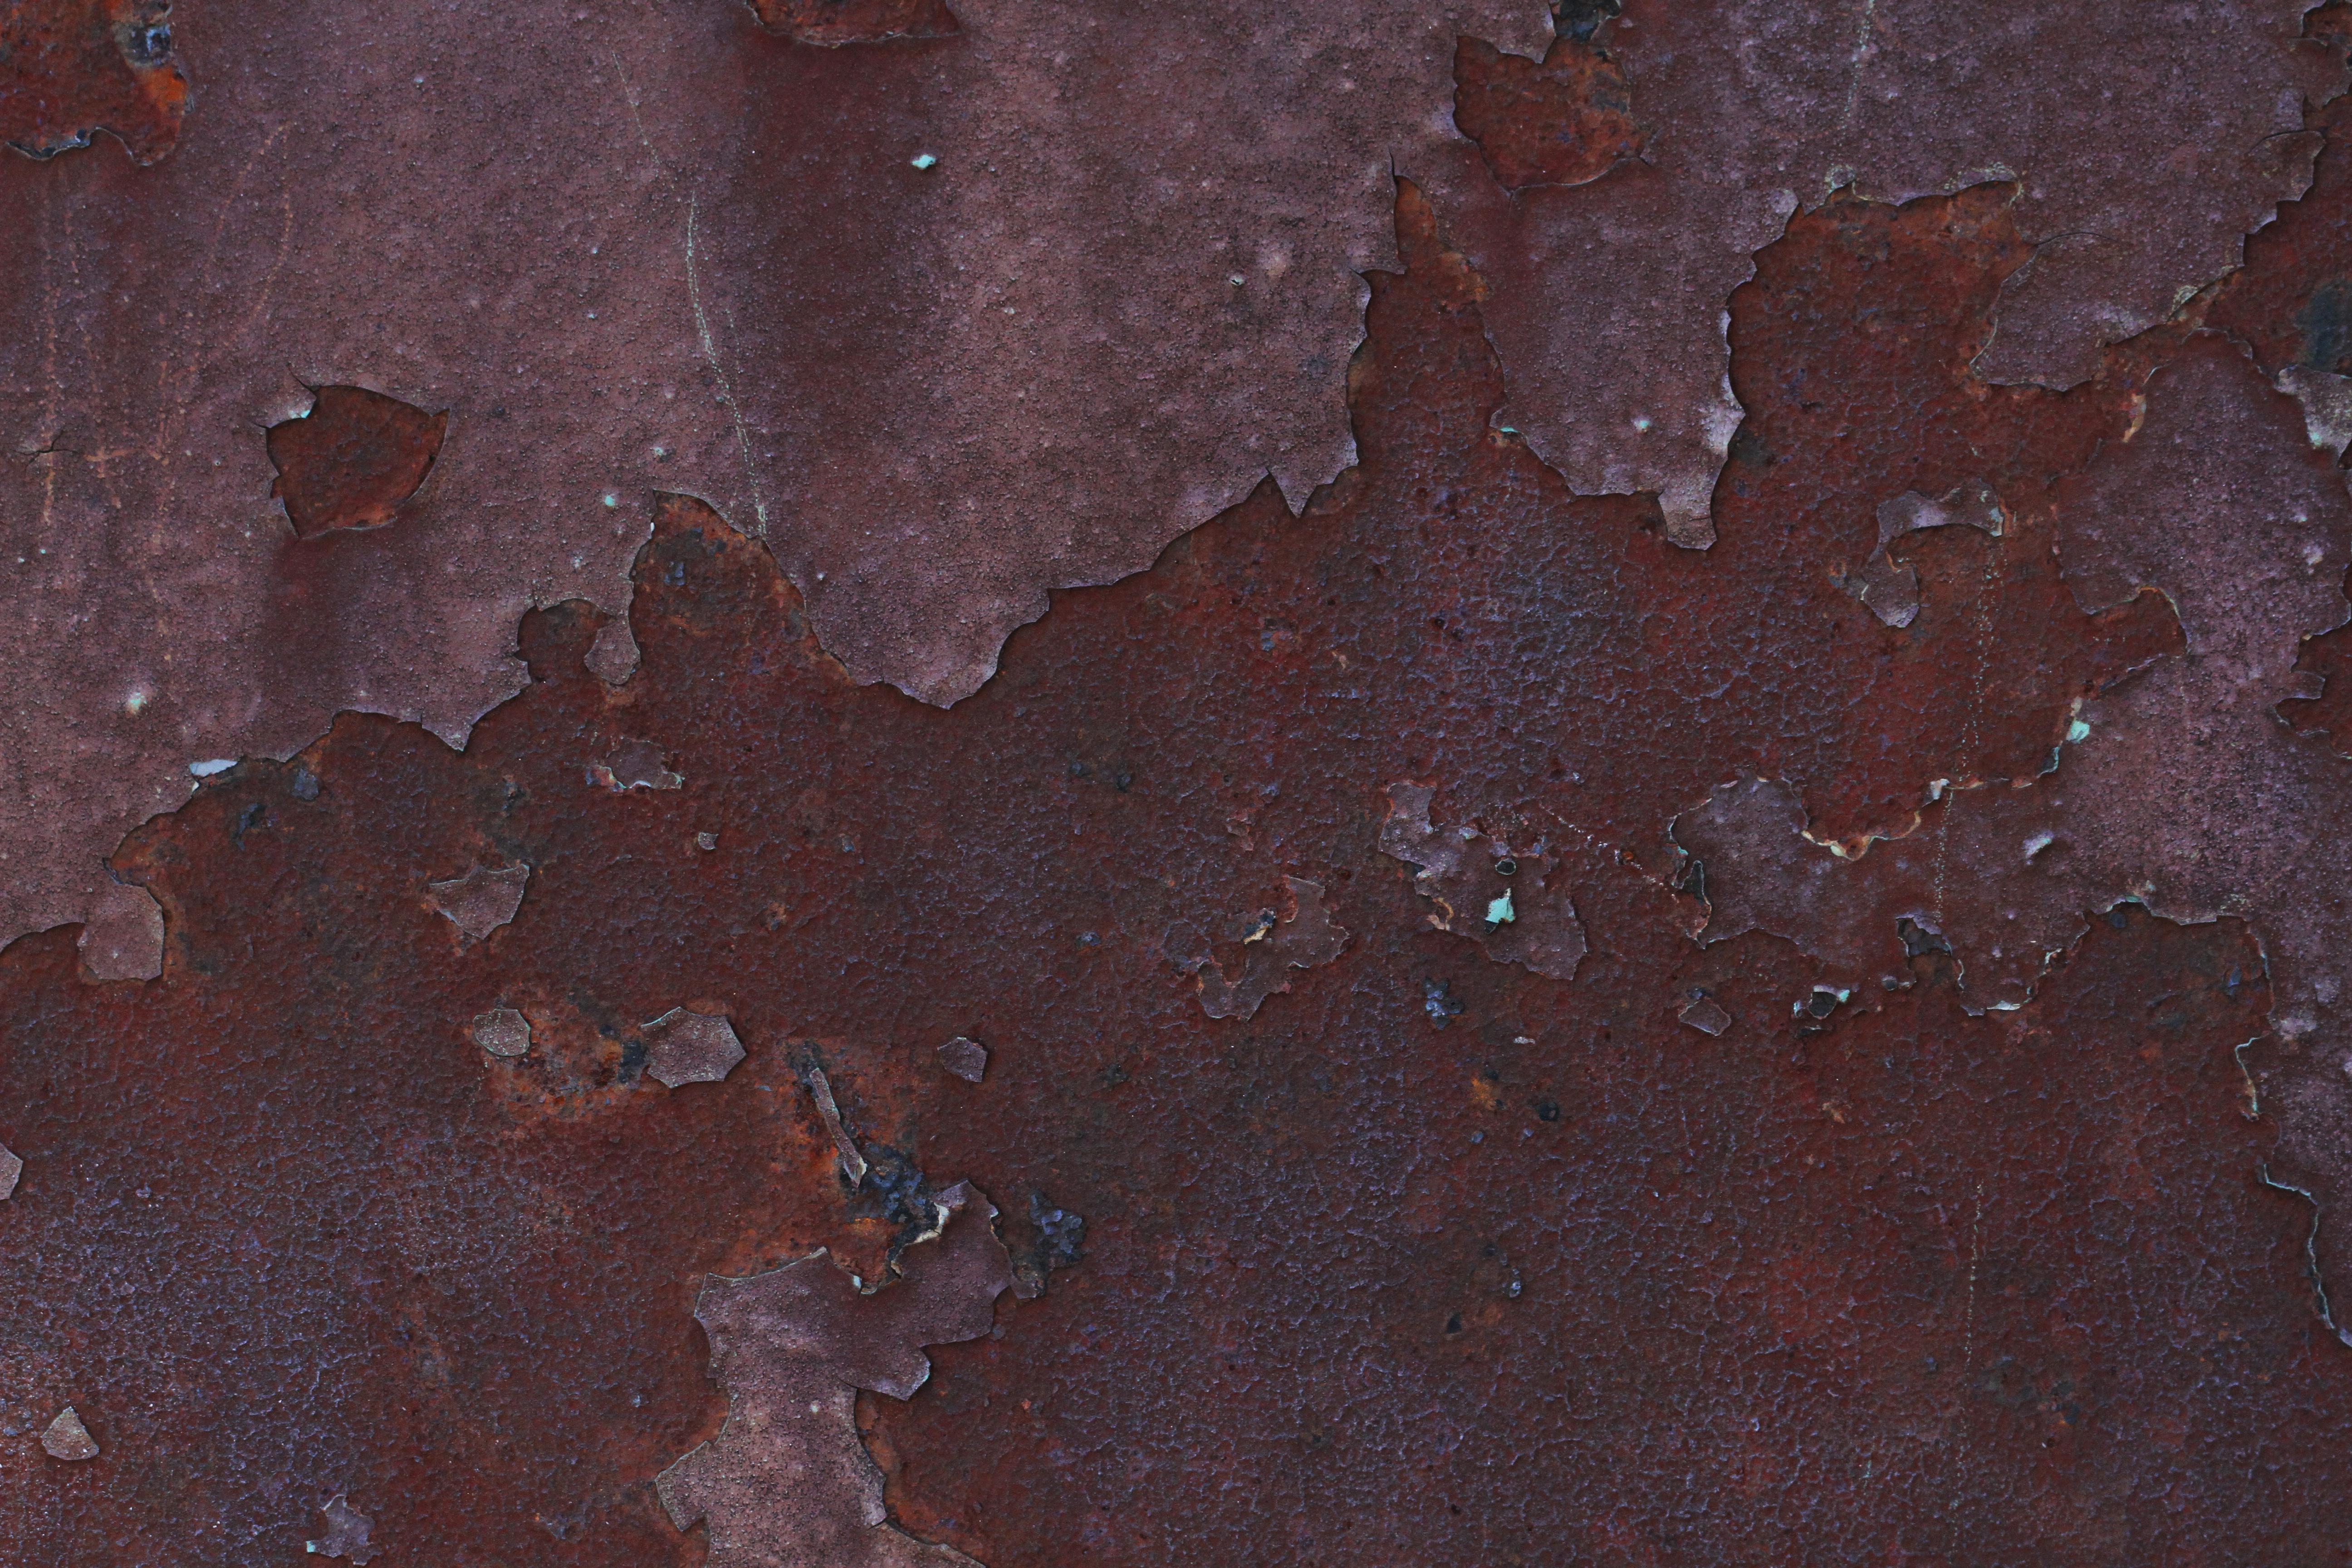 Rust Texture, Corrosion, Damaged, Freetexturefrida, Grunge, HQ Photo